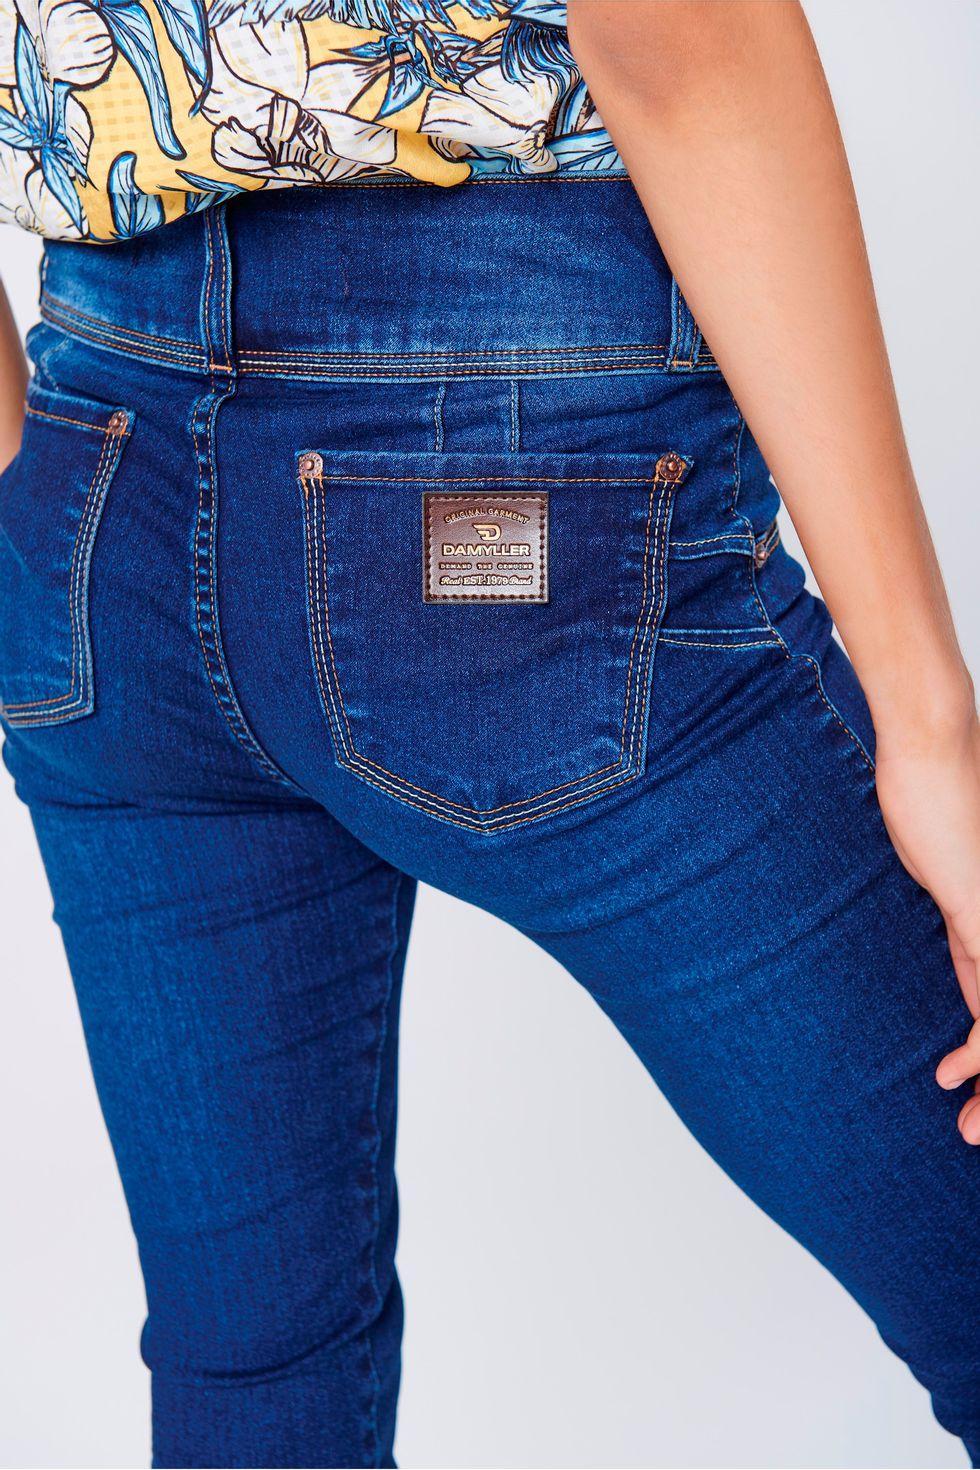 Calca-Jeans-Skinny-Up-Feminina-Detalhe--